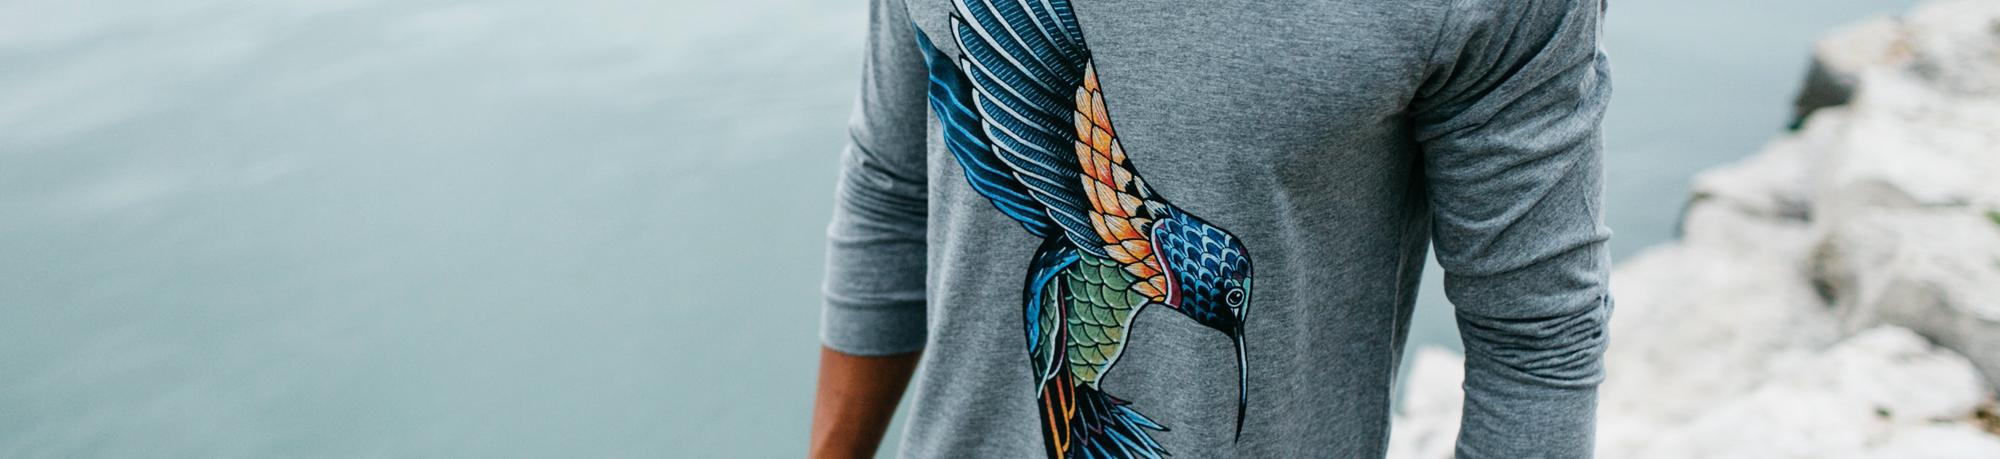 mens-long-sleeve.jpg